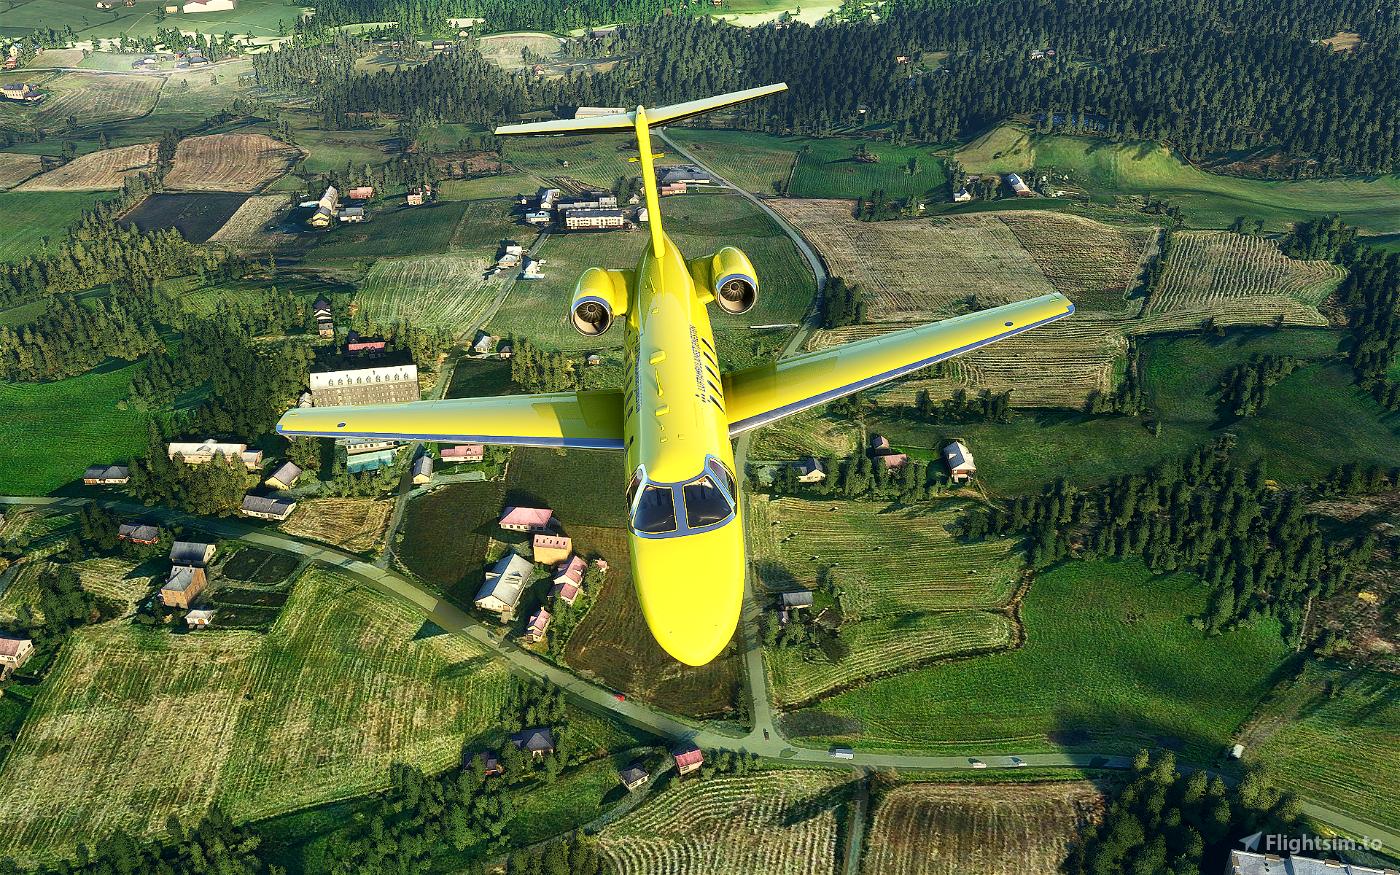 Luftambulanse Cessna CJ4